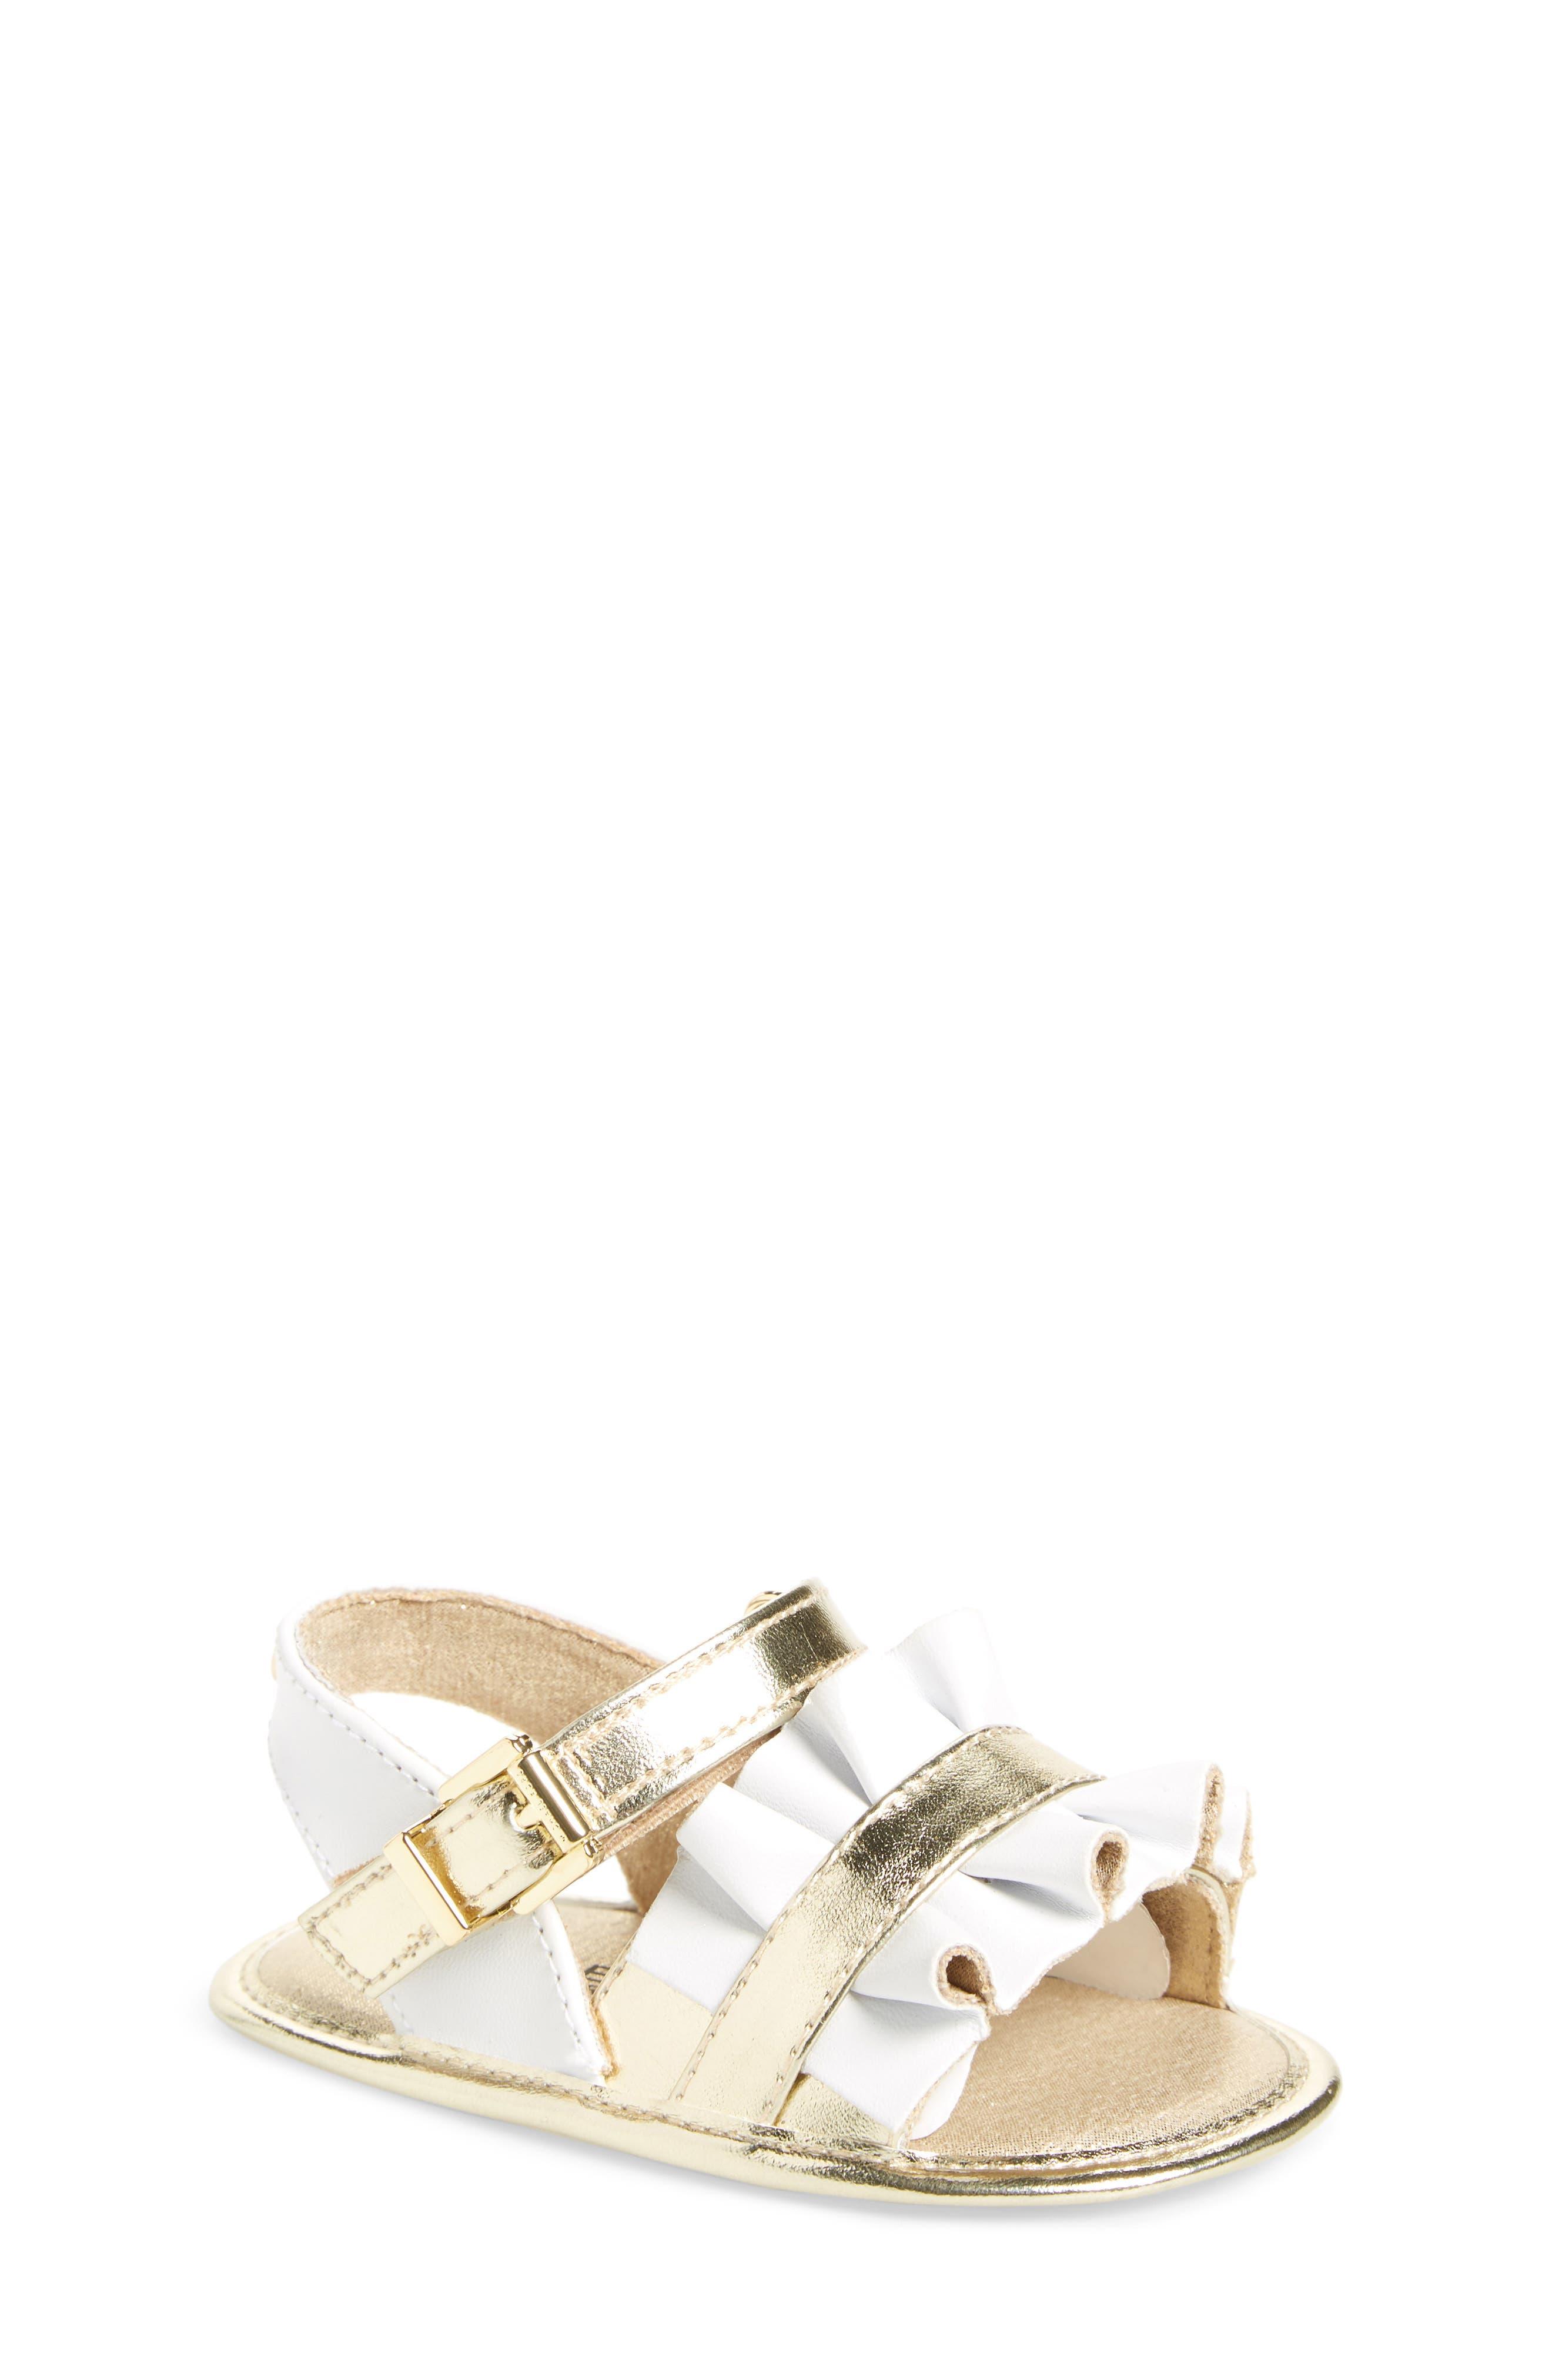 Baby Free Metallic Ruffled Sandal,                             Main thumbnail 1, color,                             White Gold